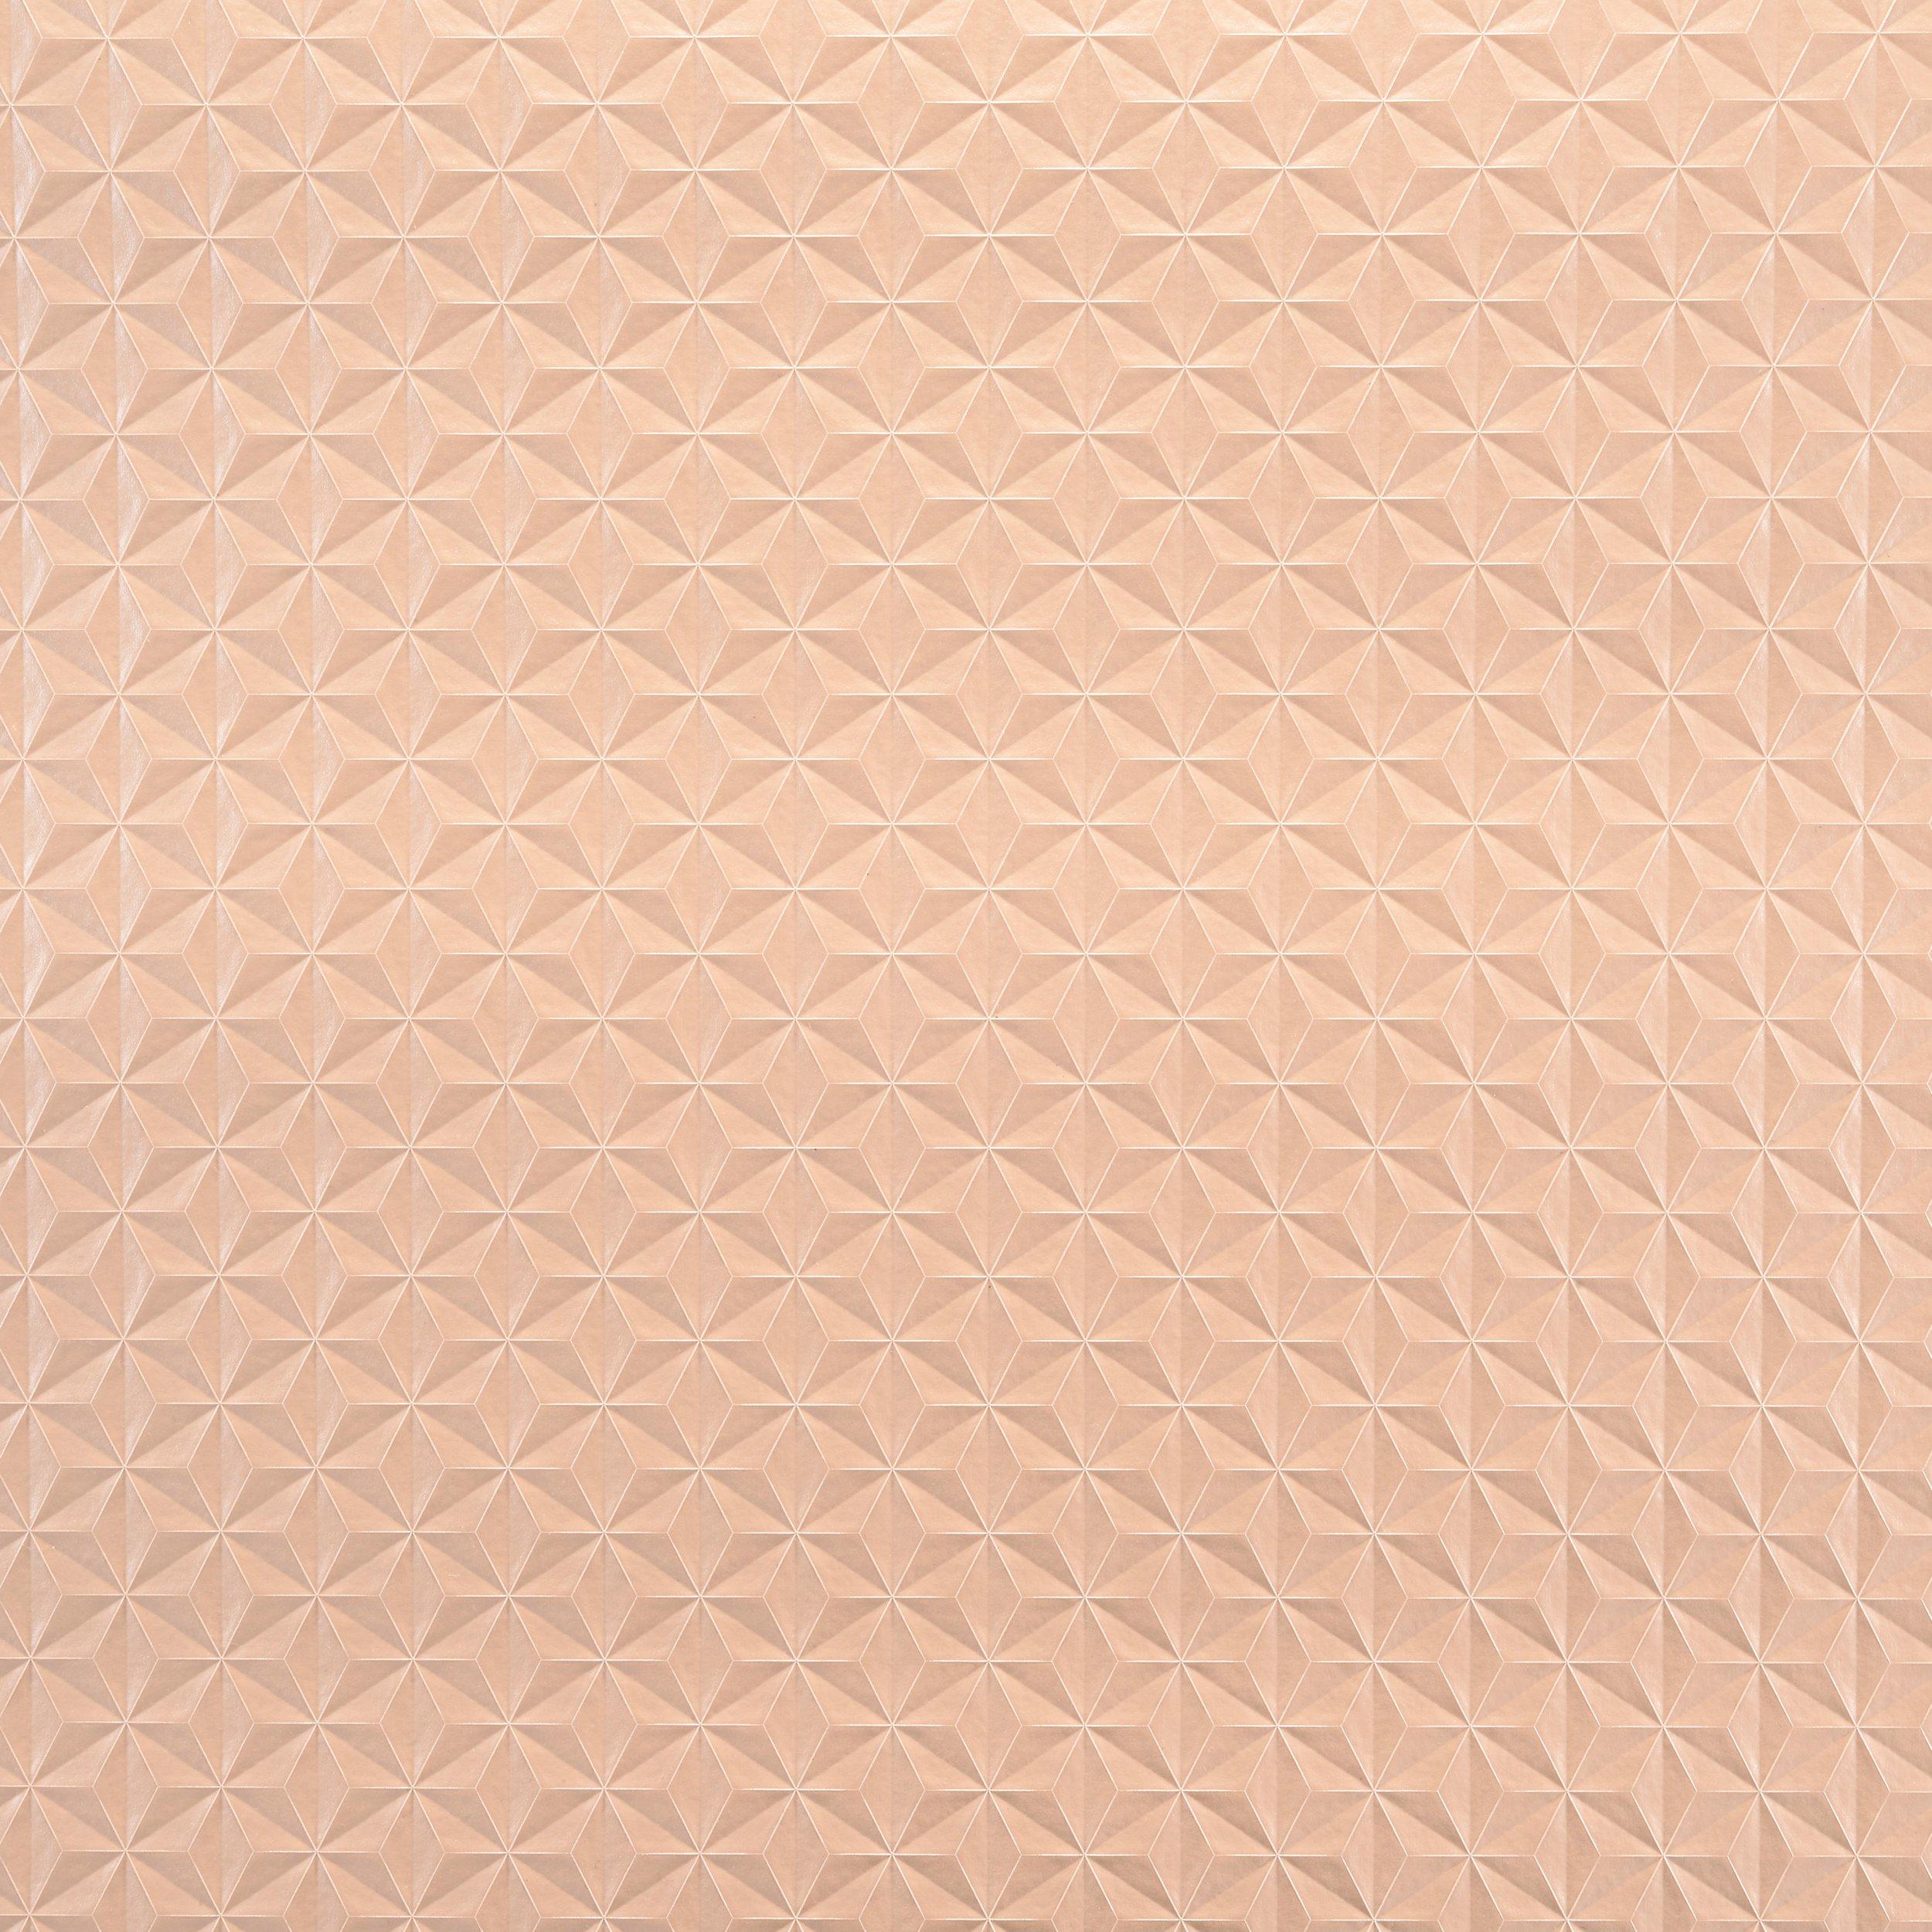 Wallpaper Sample - Pearlescent .jpg